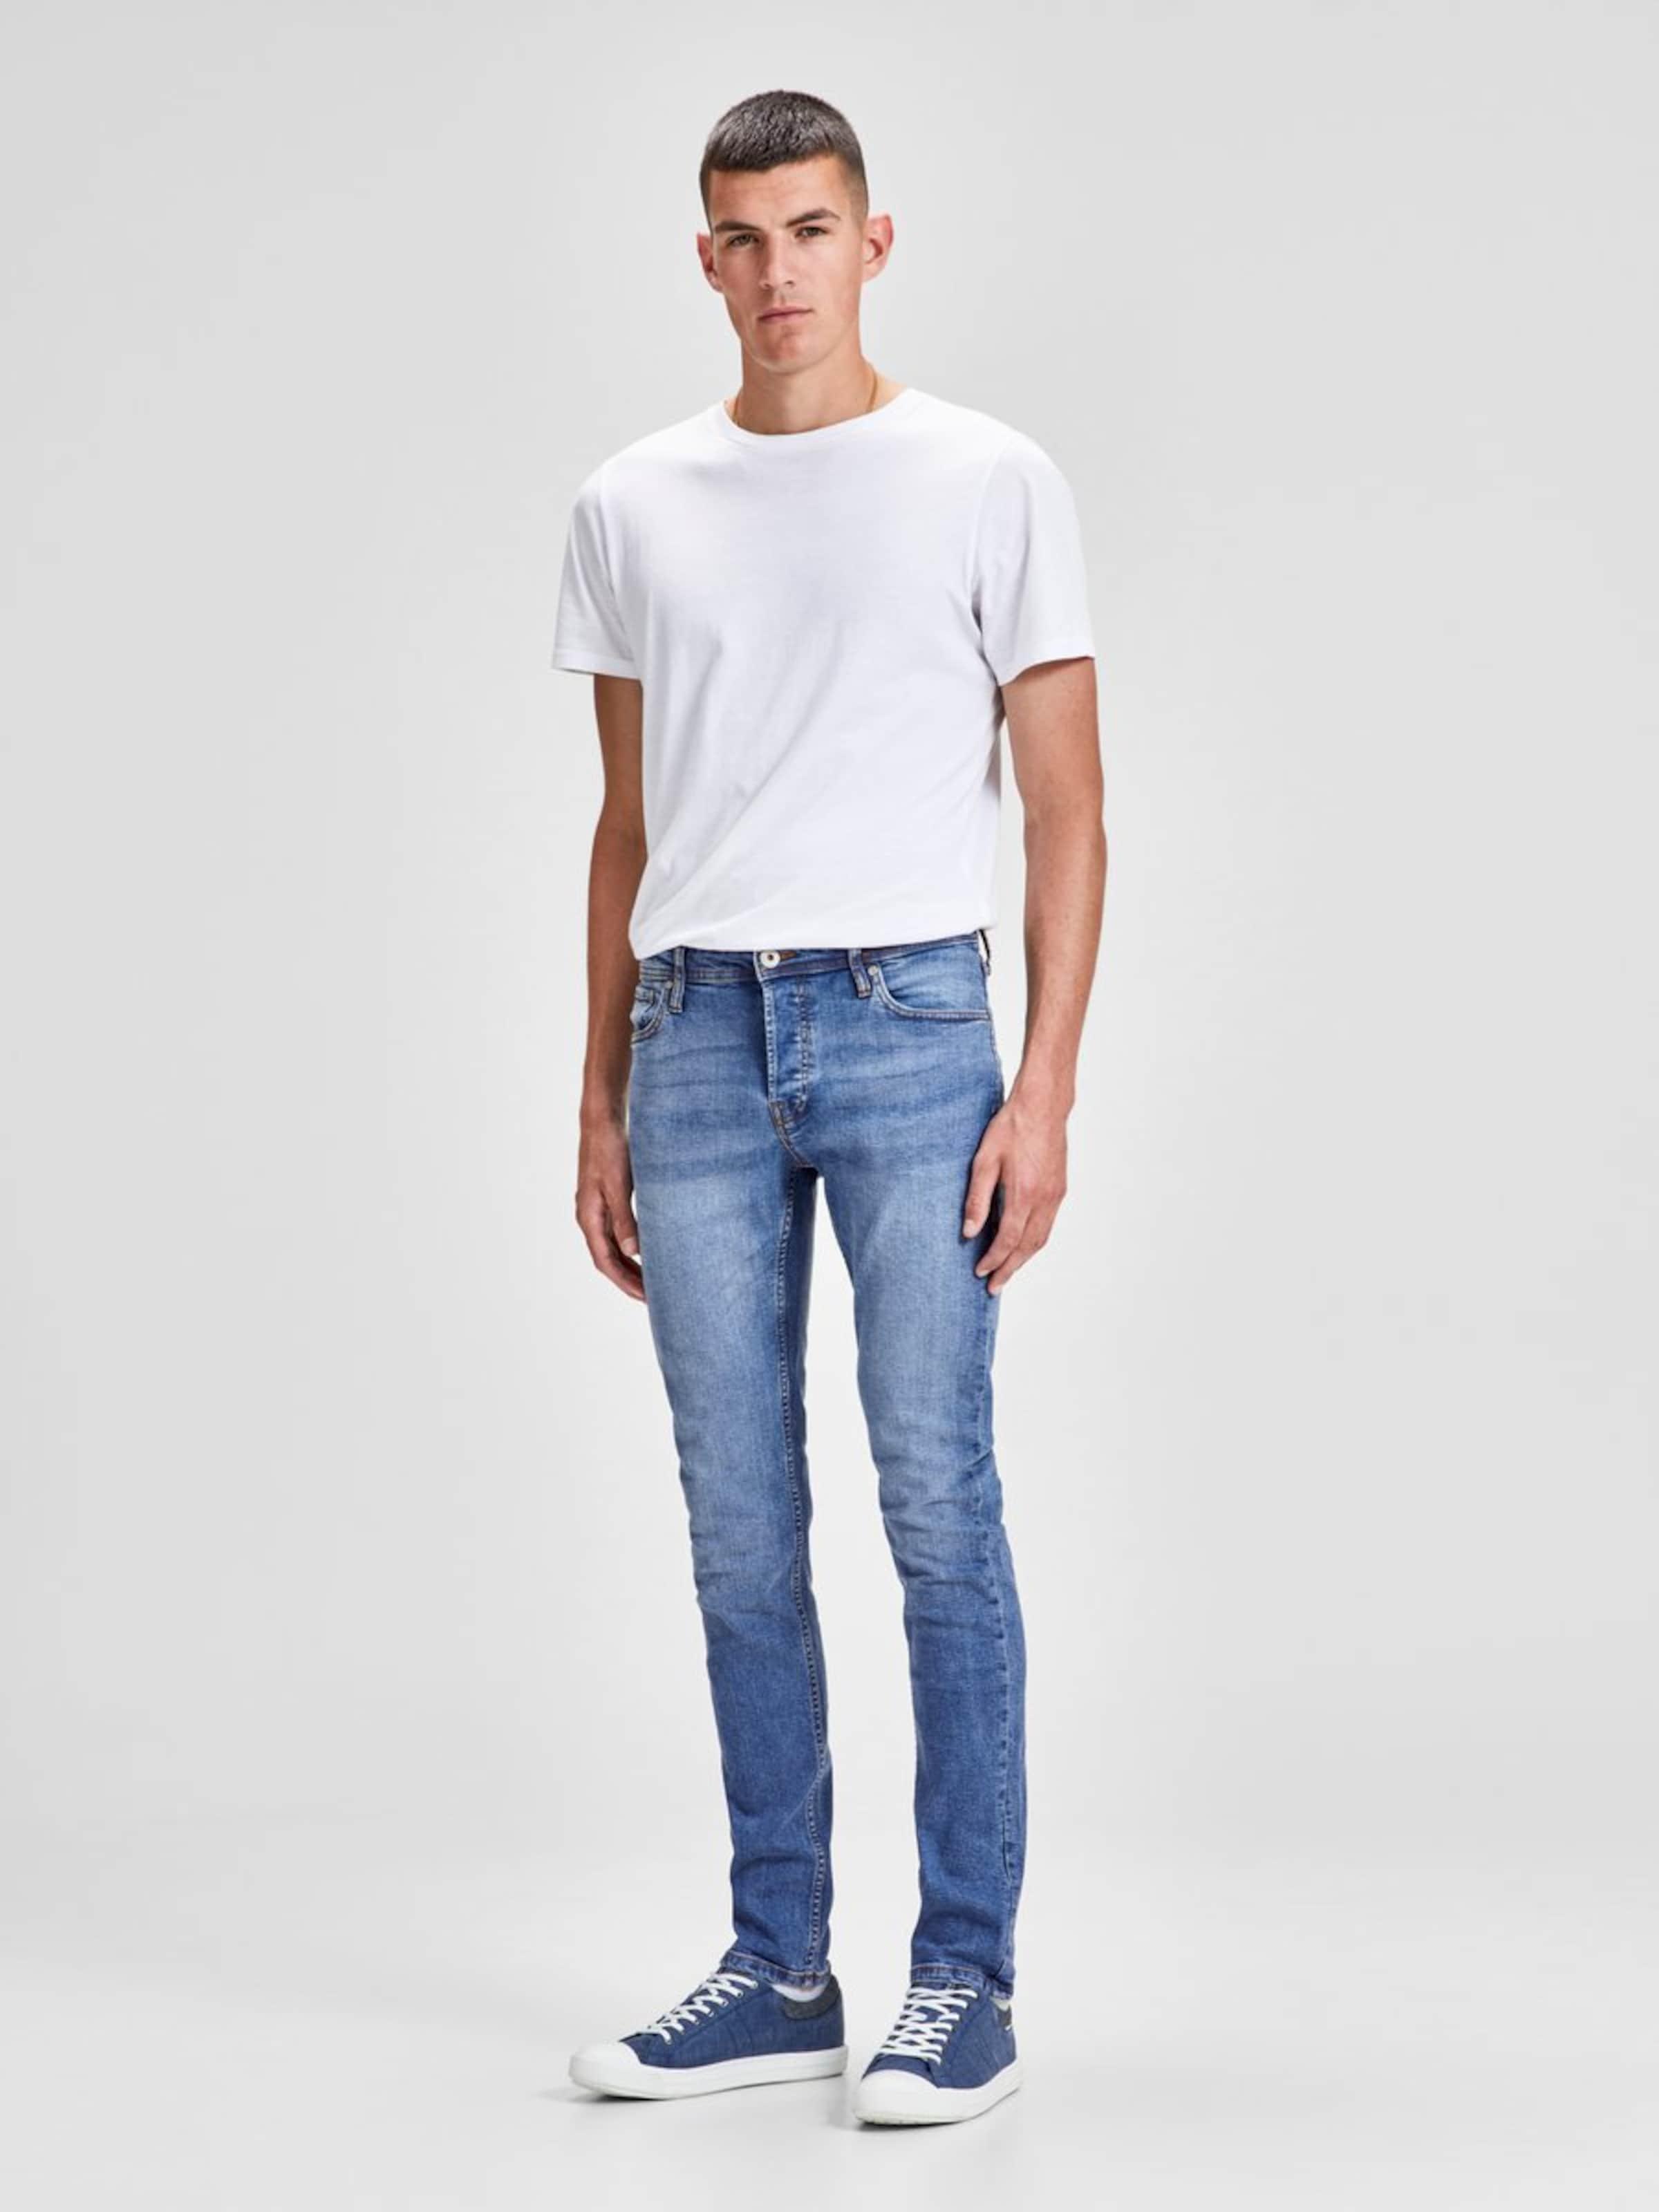 Jackamp; Original Noos' Jones Jeans In 'glenn Denim 003 Blue Nz nP8wymNOv0